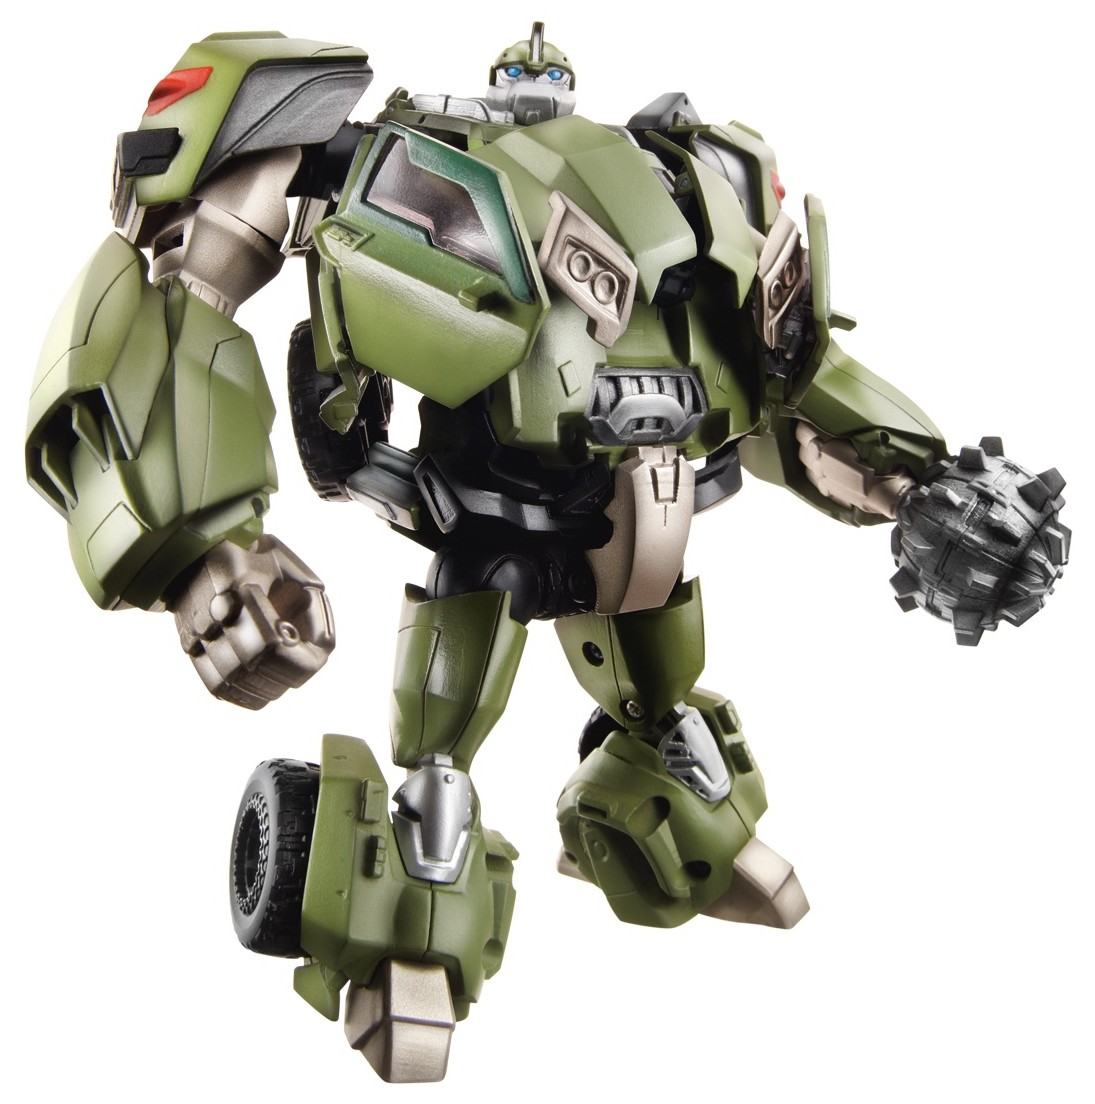 http://4.bp.blogspot.com/-7cIxezO99C4/TleakvLUaaI/AAAAAAAABOA/Ac90HYYEXzo/s1600/transformers-prime-bulkhead.jpg